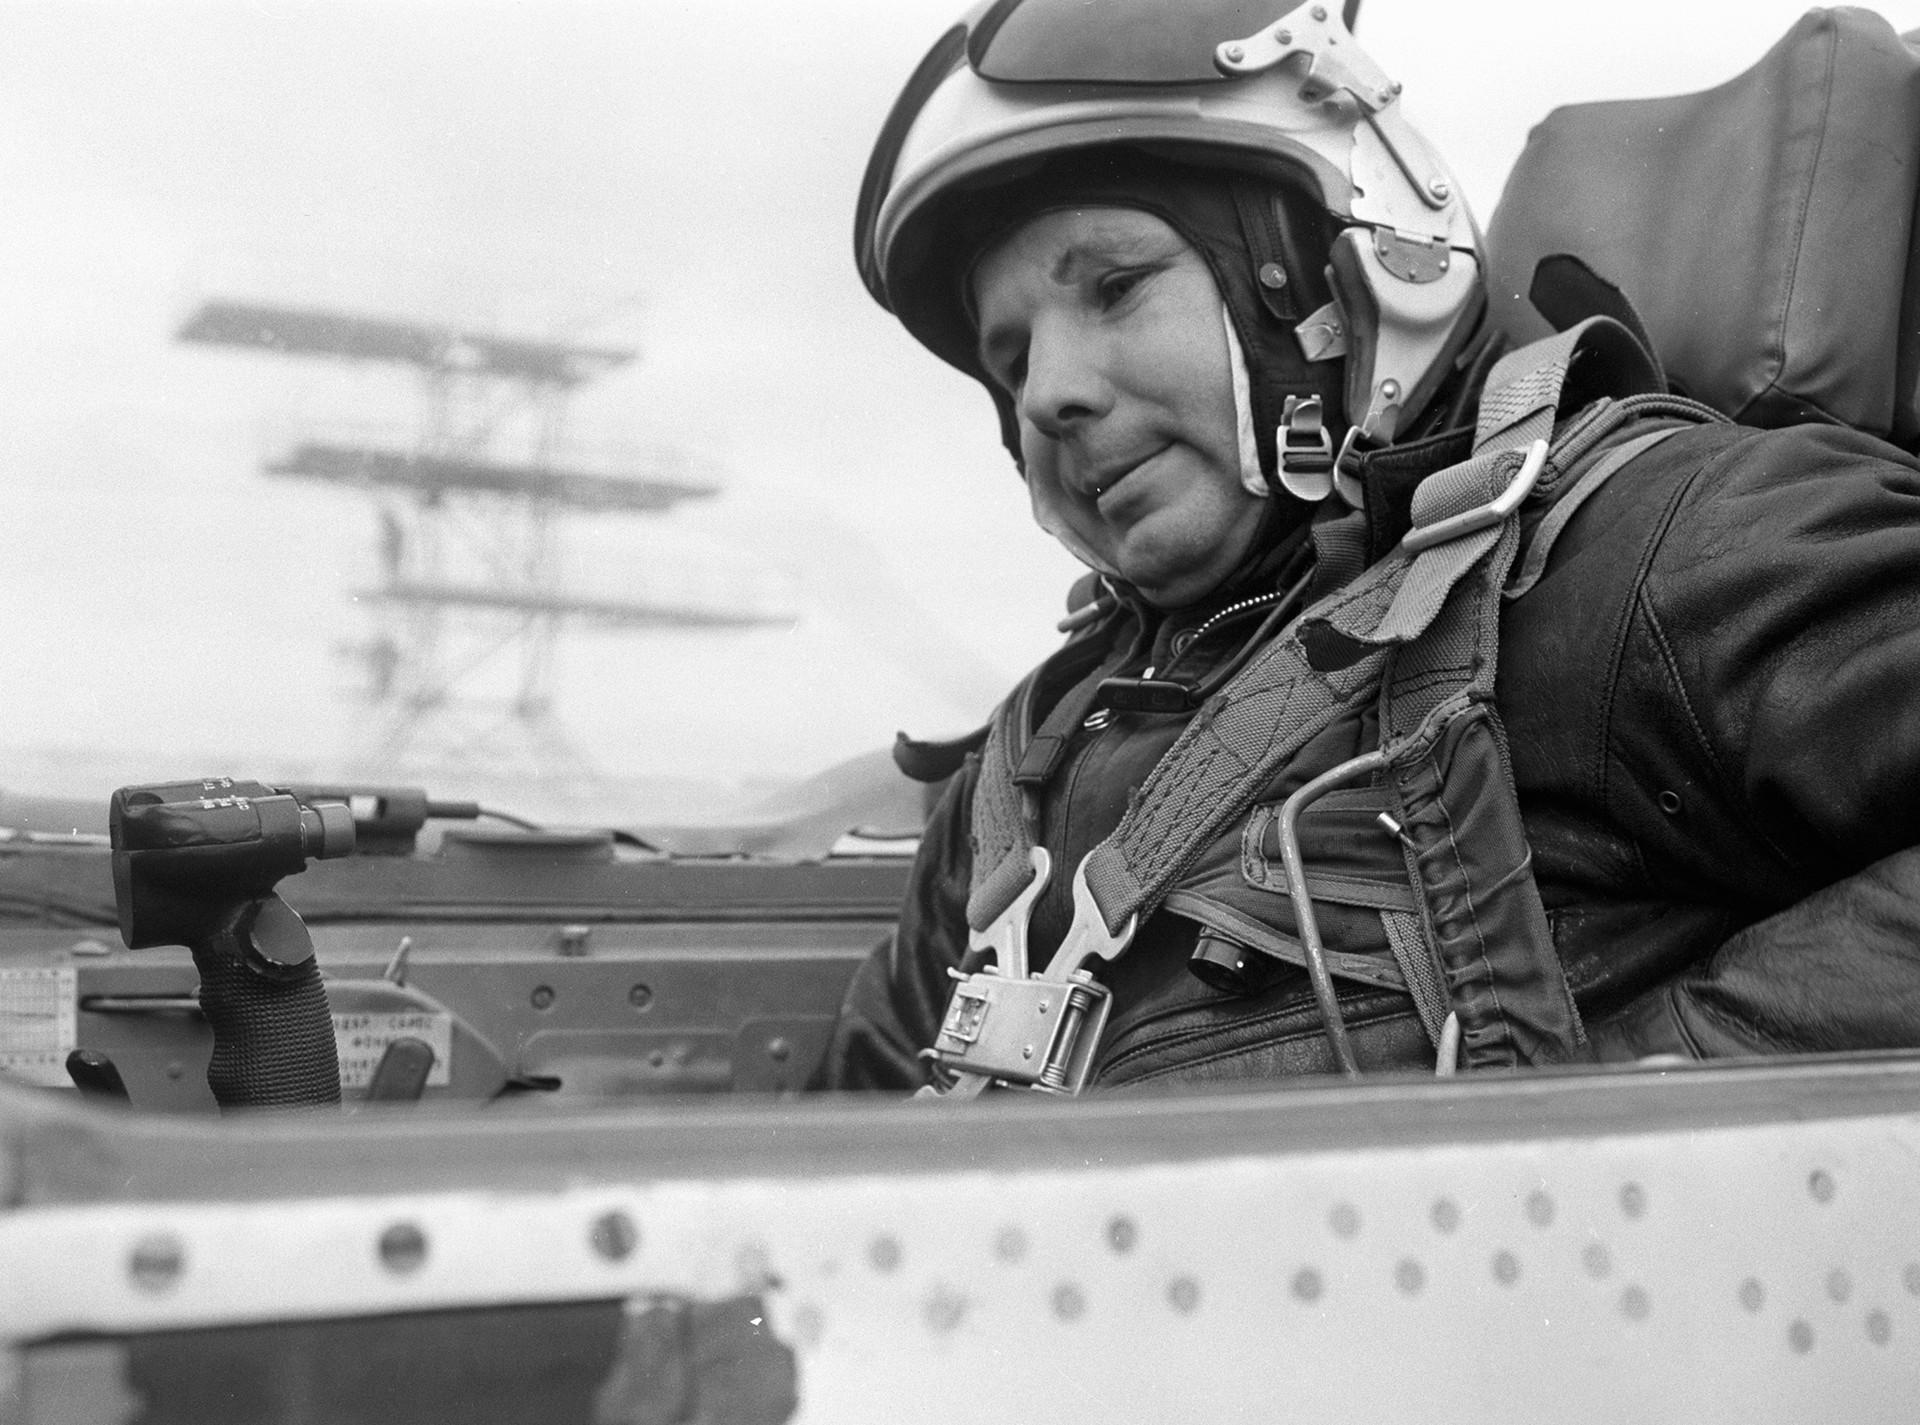 Jurij Gagarin se sprema izvršiti zadatak na supersoničnom mlaznom lovcu MiG-21, 1. listopada 1967.